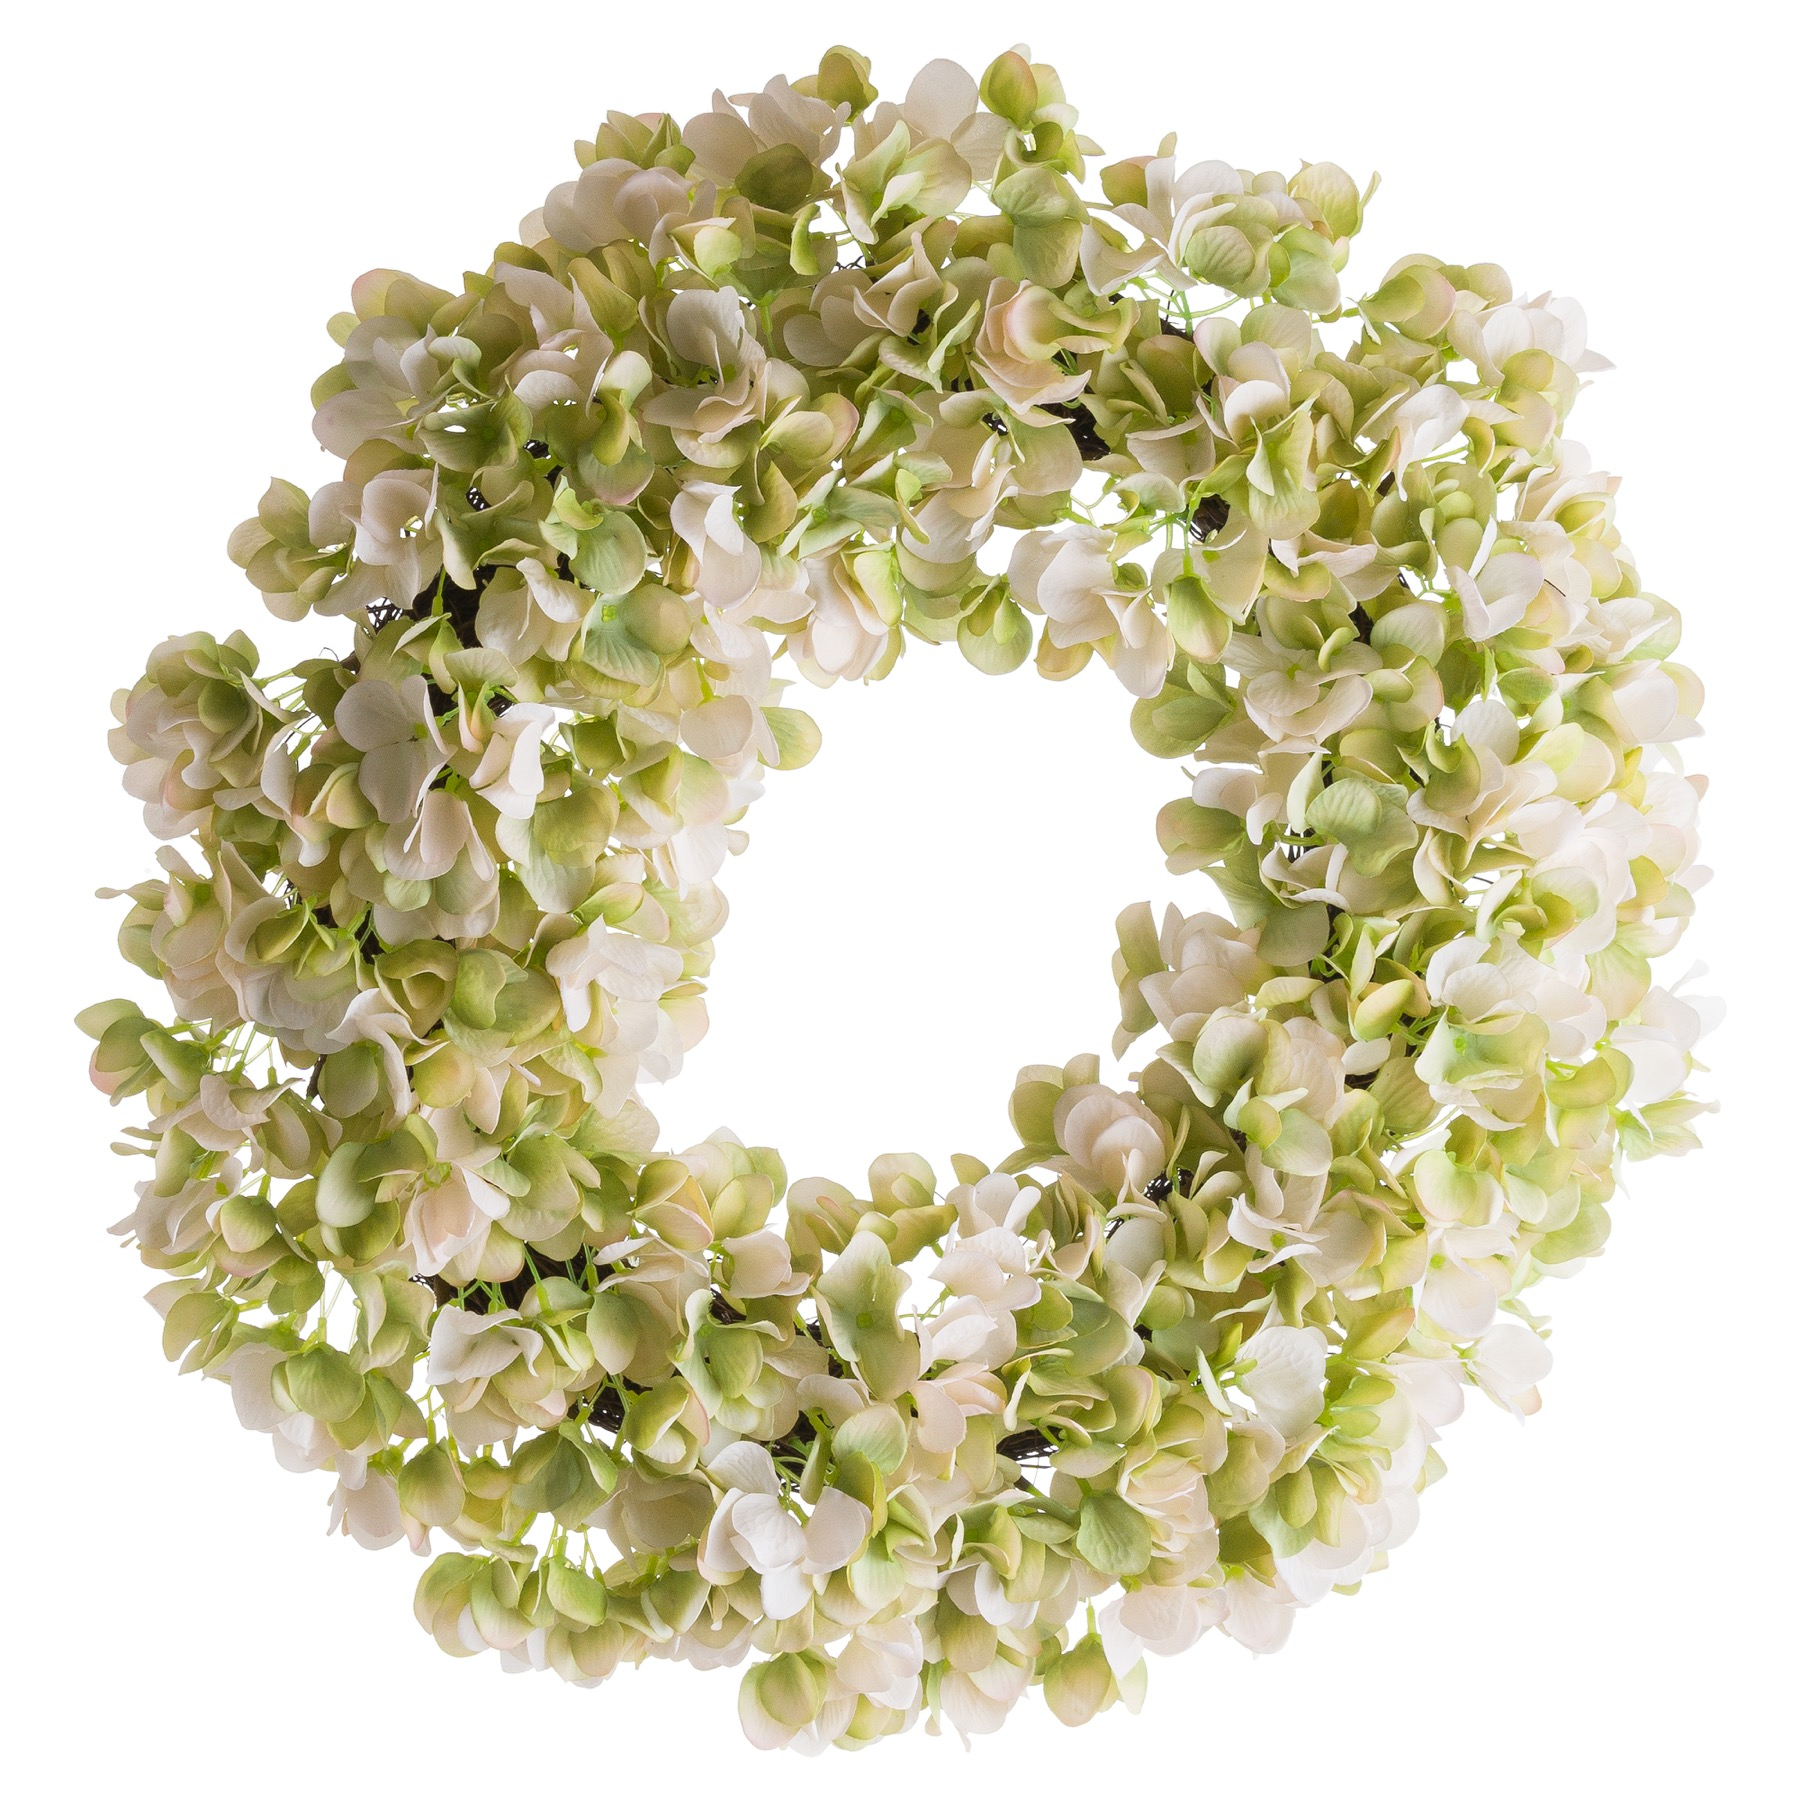 White Hydrangea Wreath - Image 1